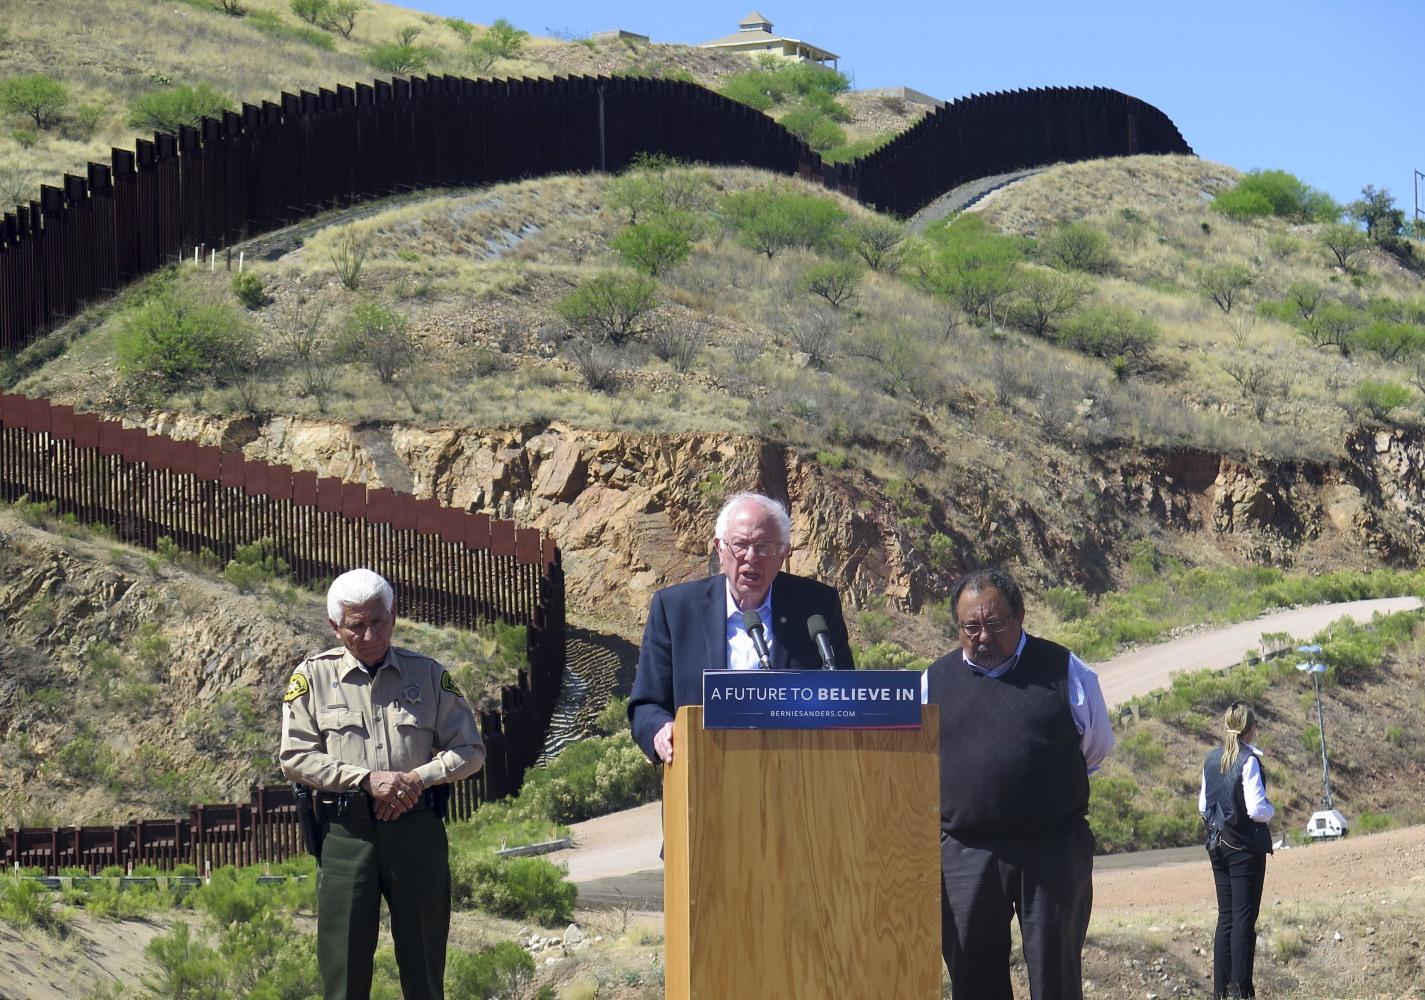 Bernie Sanders Calls for Immigration Reform During U.S